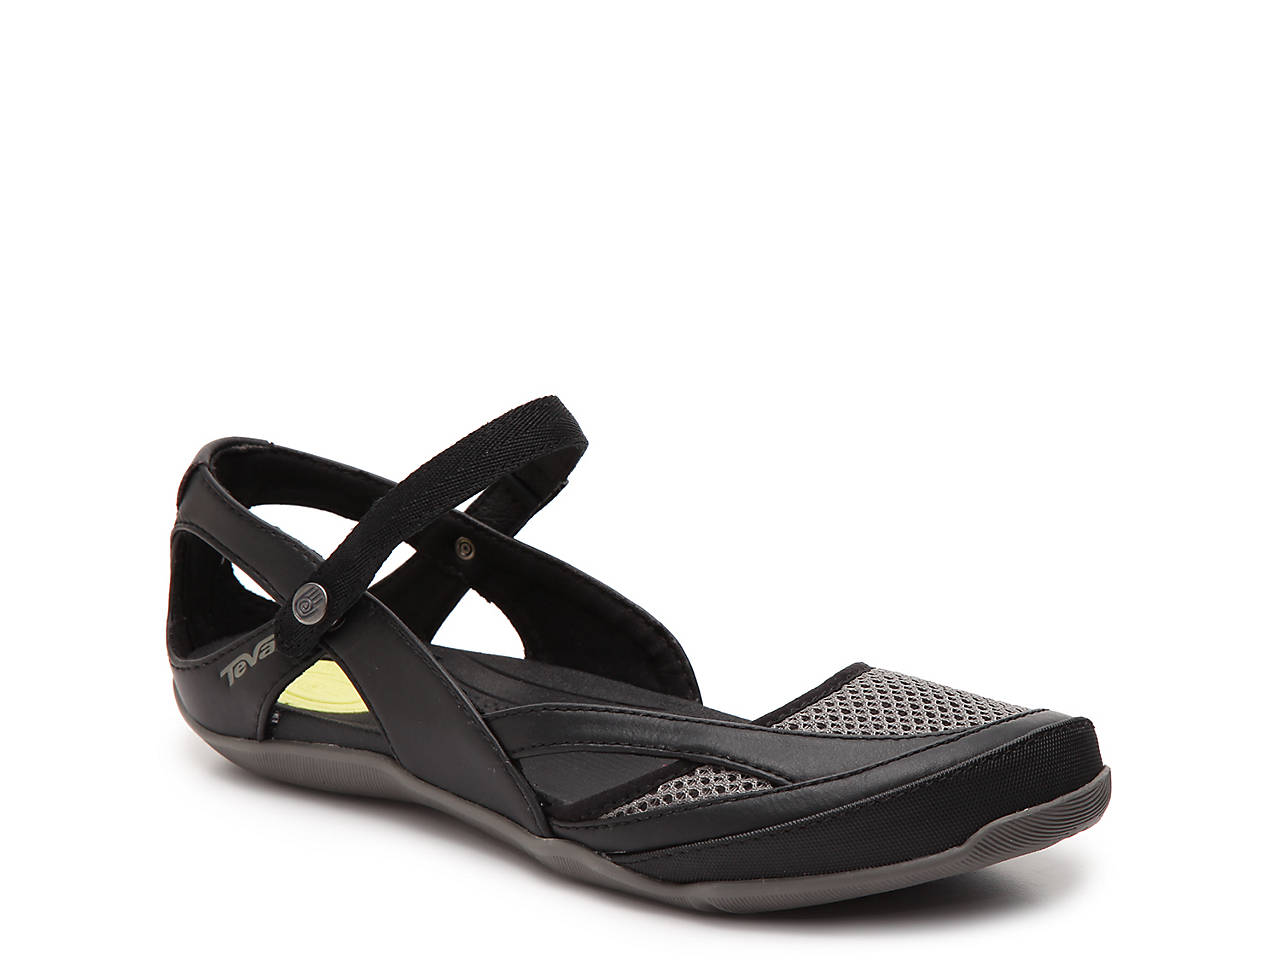 a1a31e734 Teva Northwater Sport Flat Women s Shoes